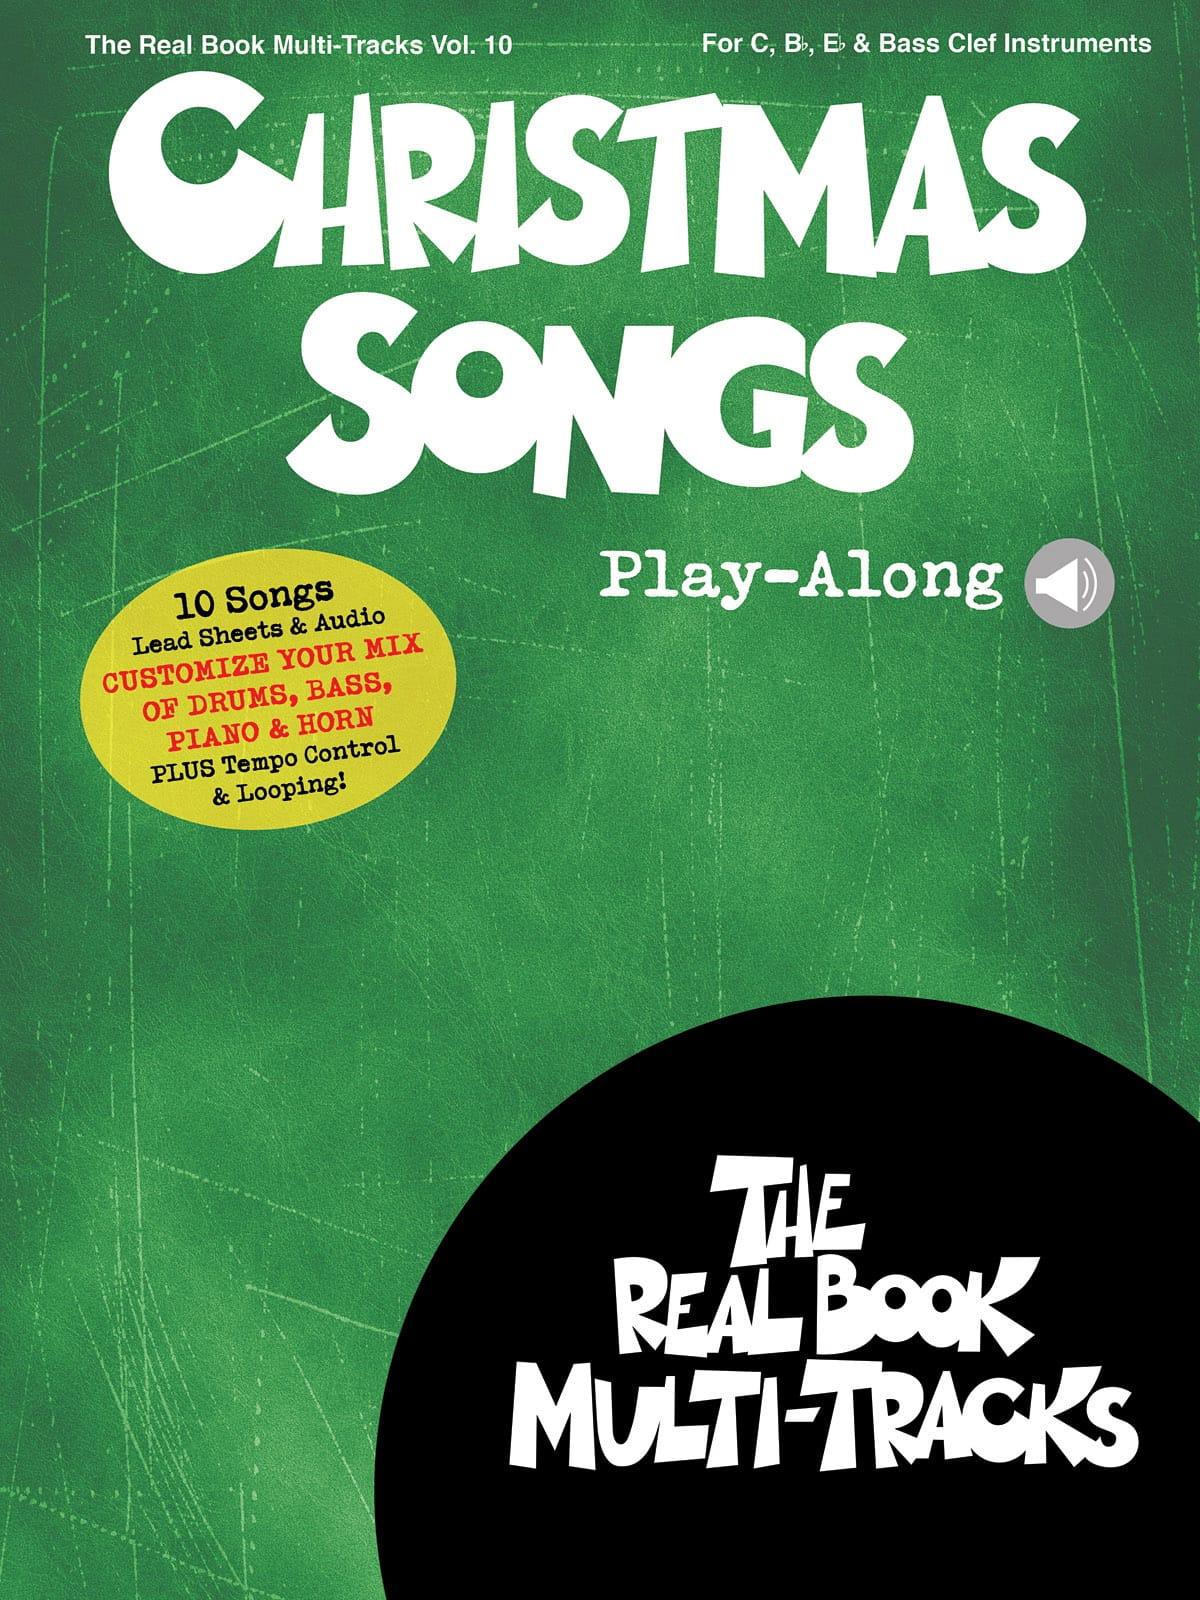 Real Book Multi-Tracks Volume 10 - Christmas Songs Play-Along - laflutedepan.com